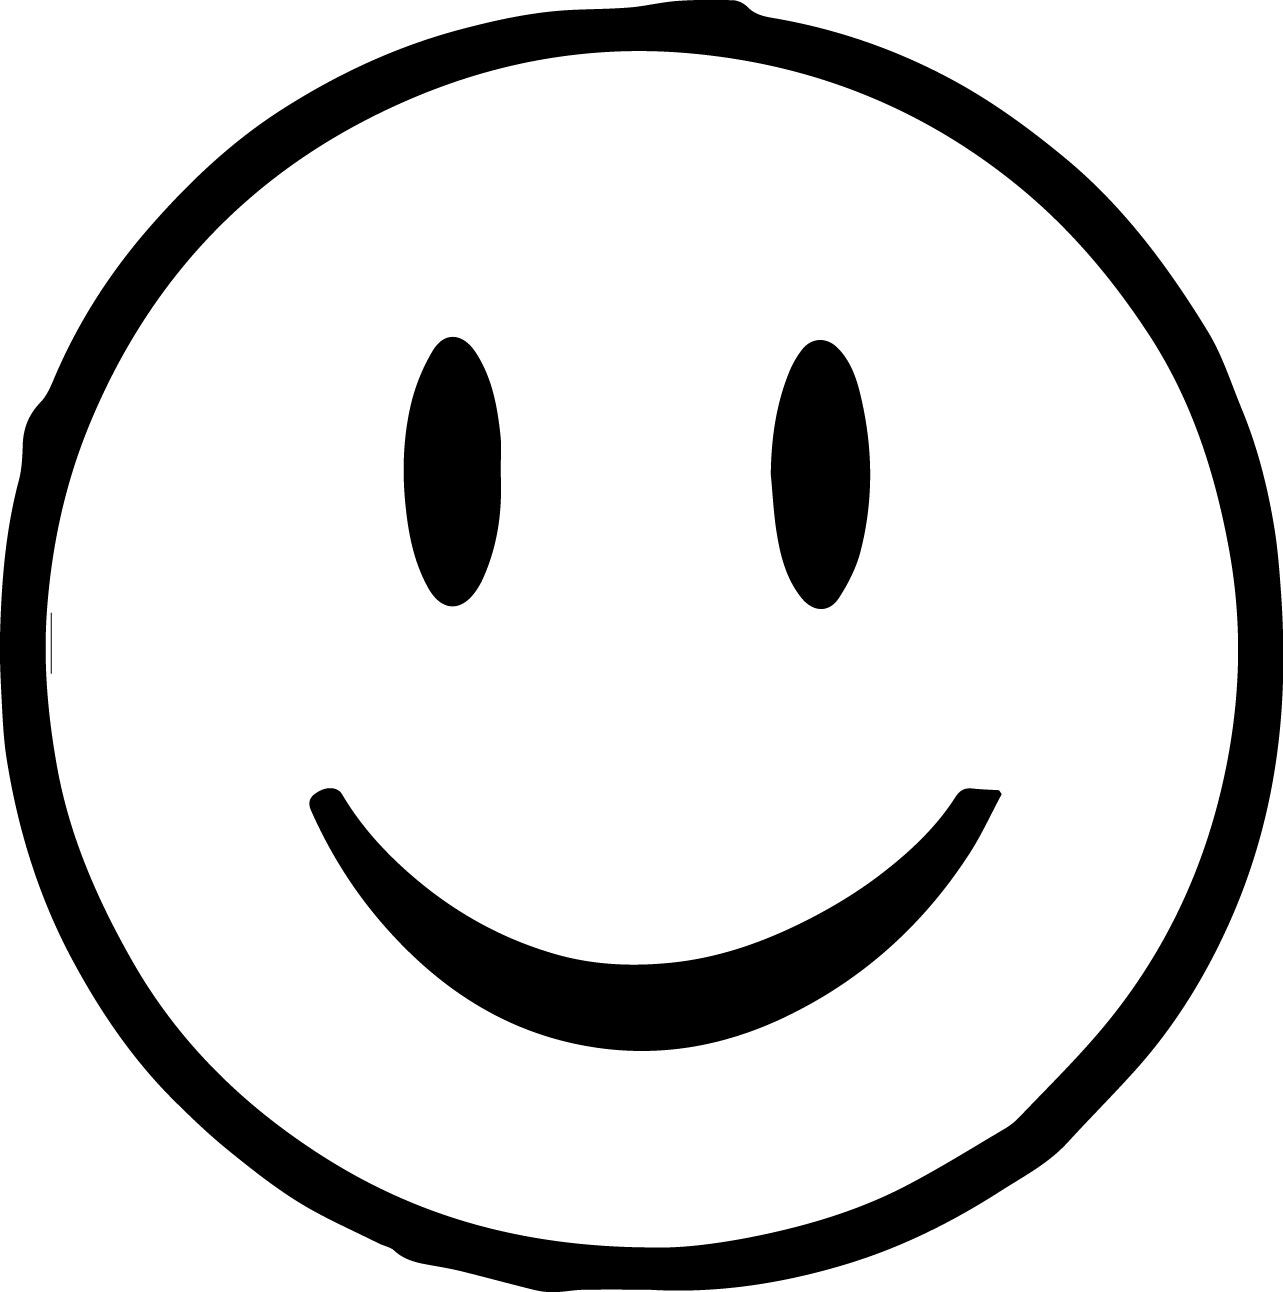 Cool Emoticon Face Coloring Pages Desenho De Emoji Desenho